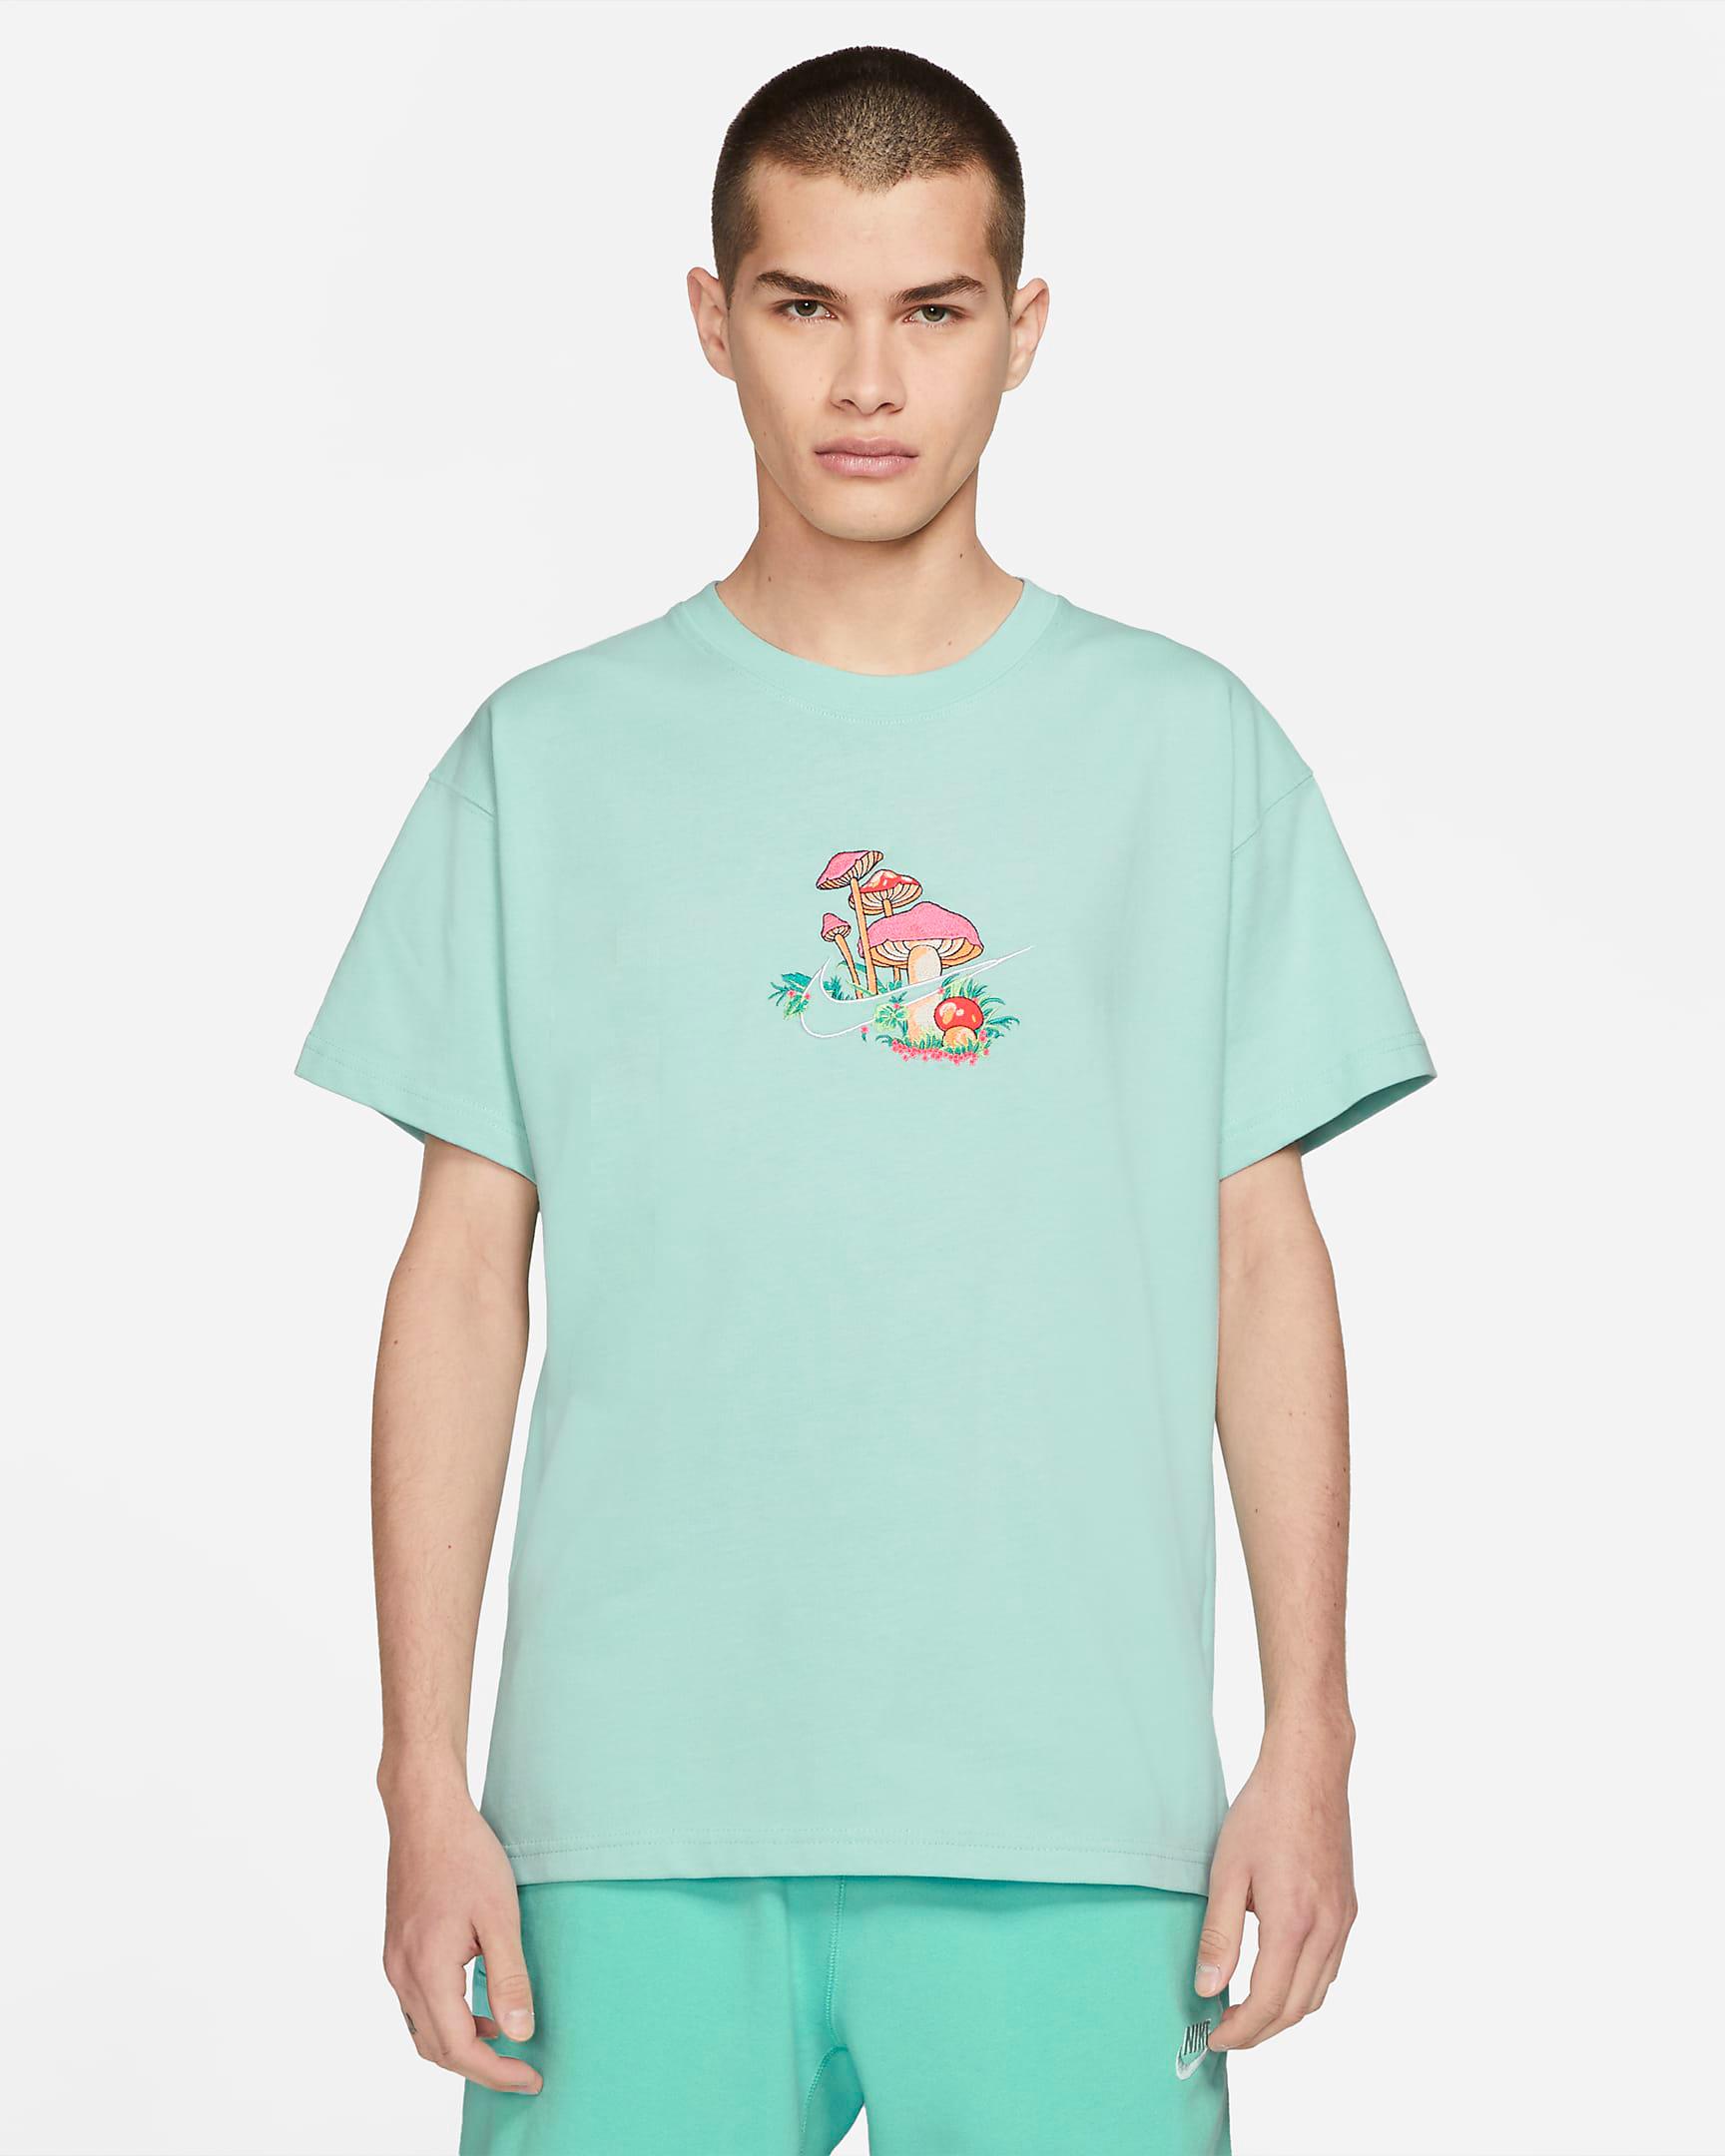 nike-light-dew-mushroom-t-shirt